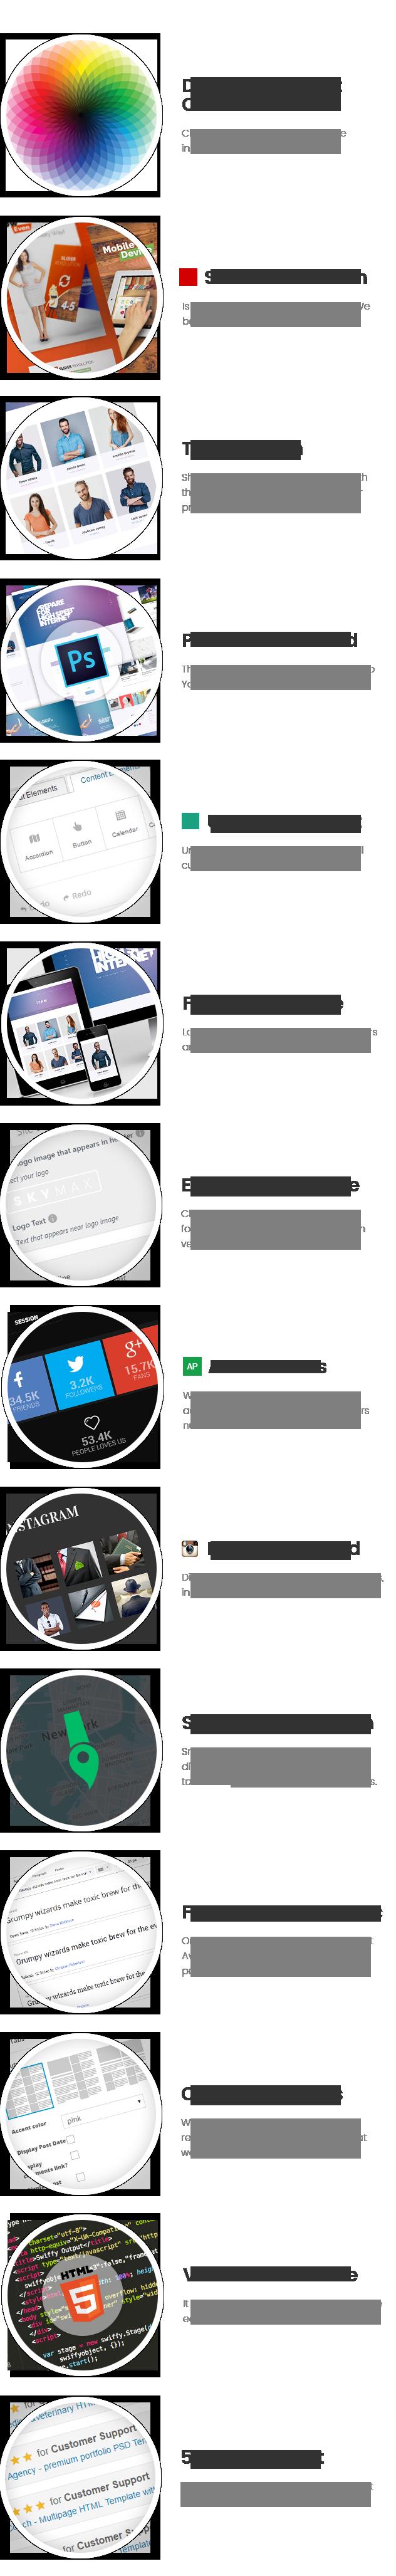 SkyMax – SP, Software Development & VoiP Service Company